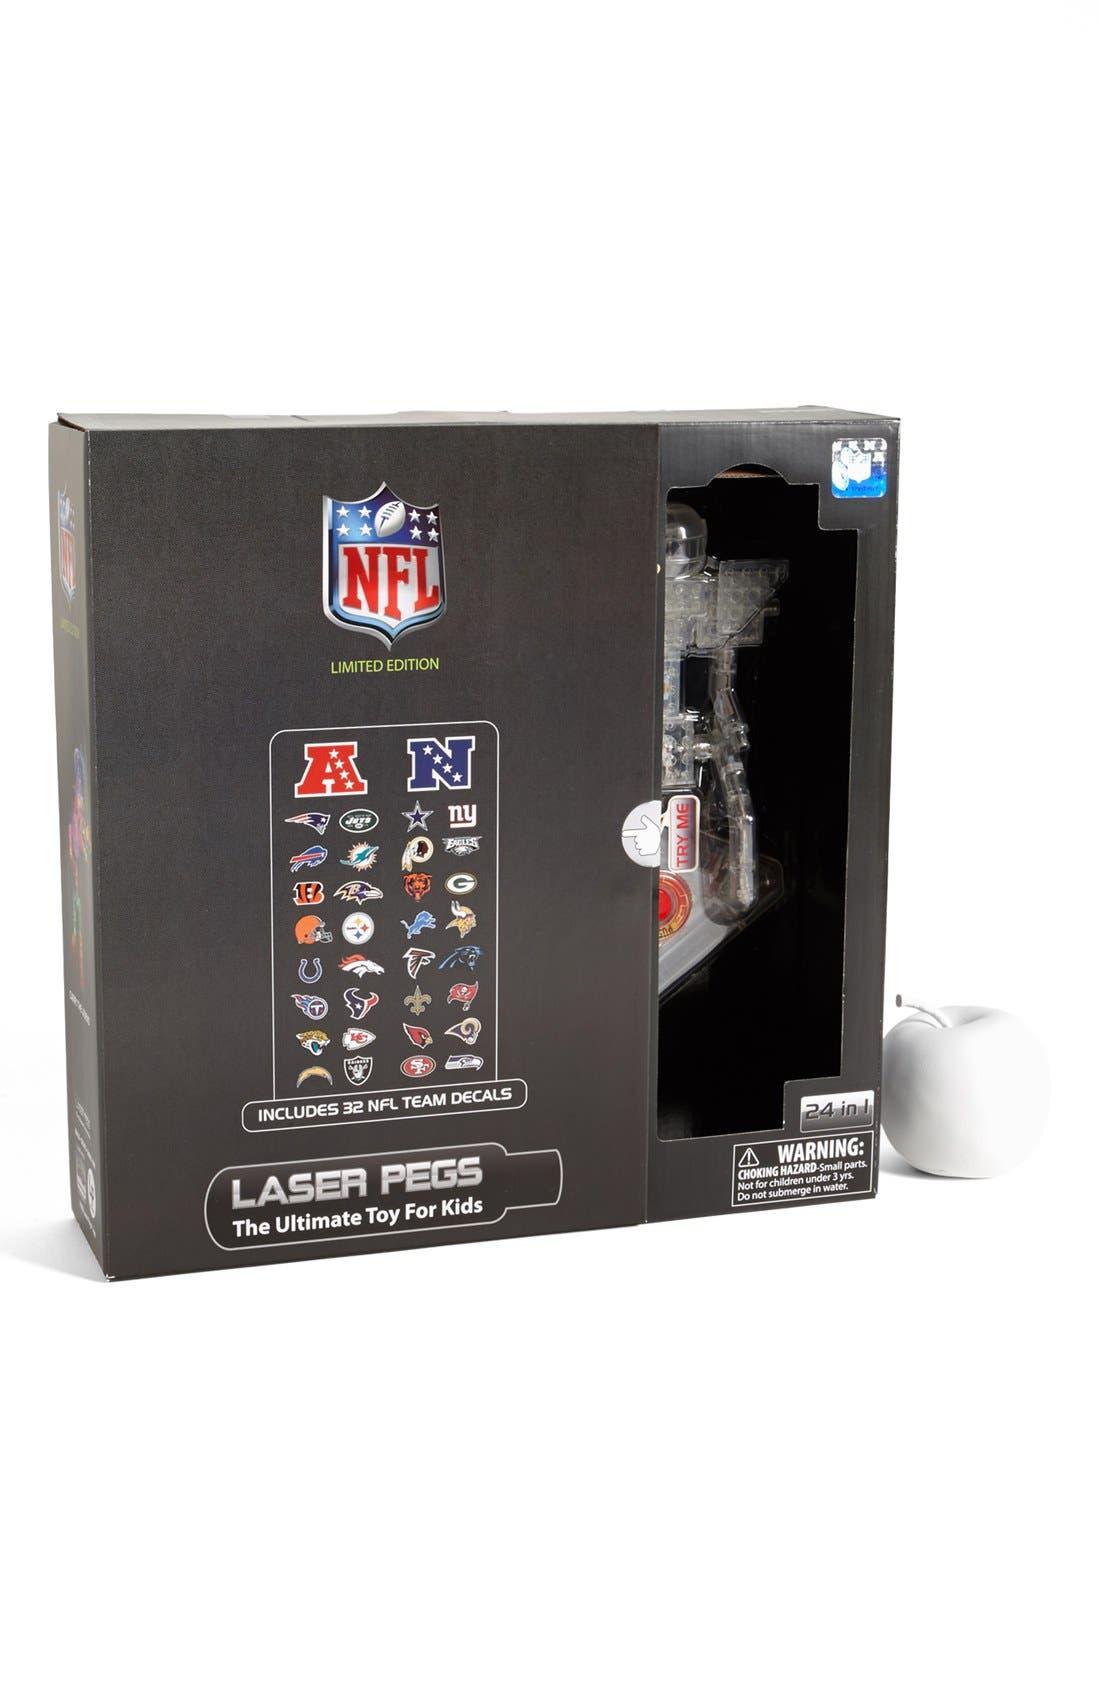 Alternate Image 1 Selected - Laser Pegs 'NFL' 24-in-1 Robot